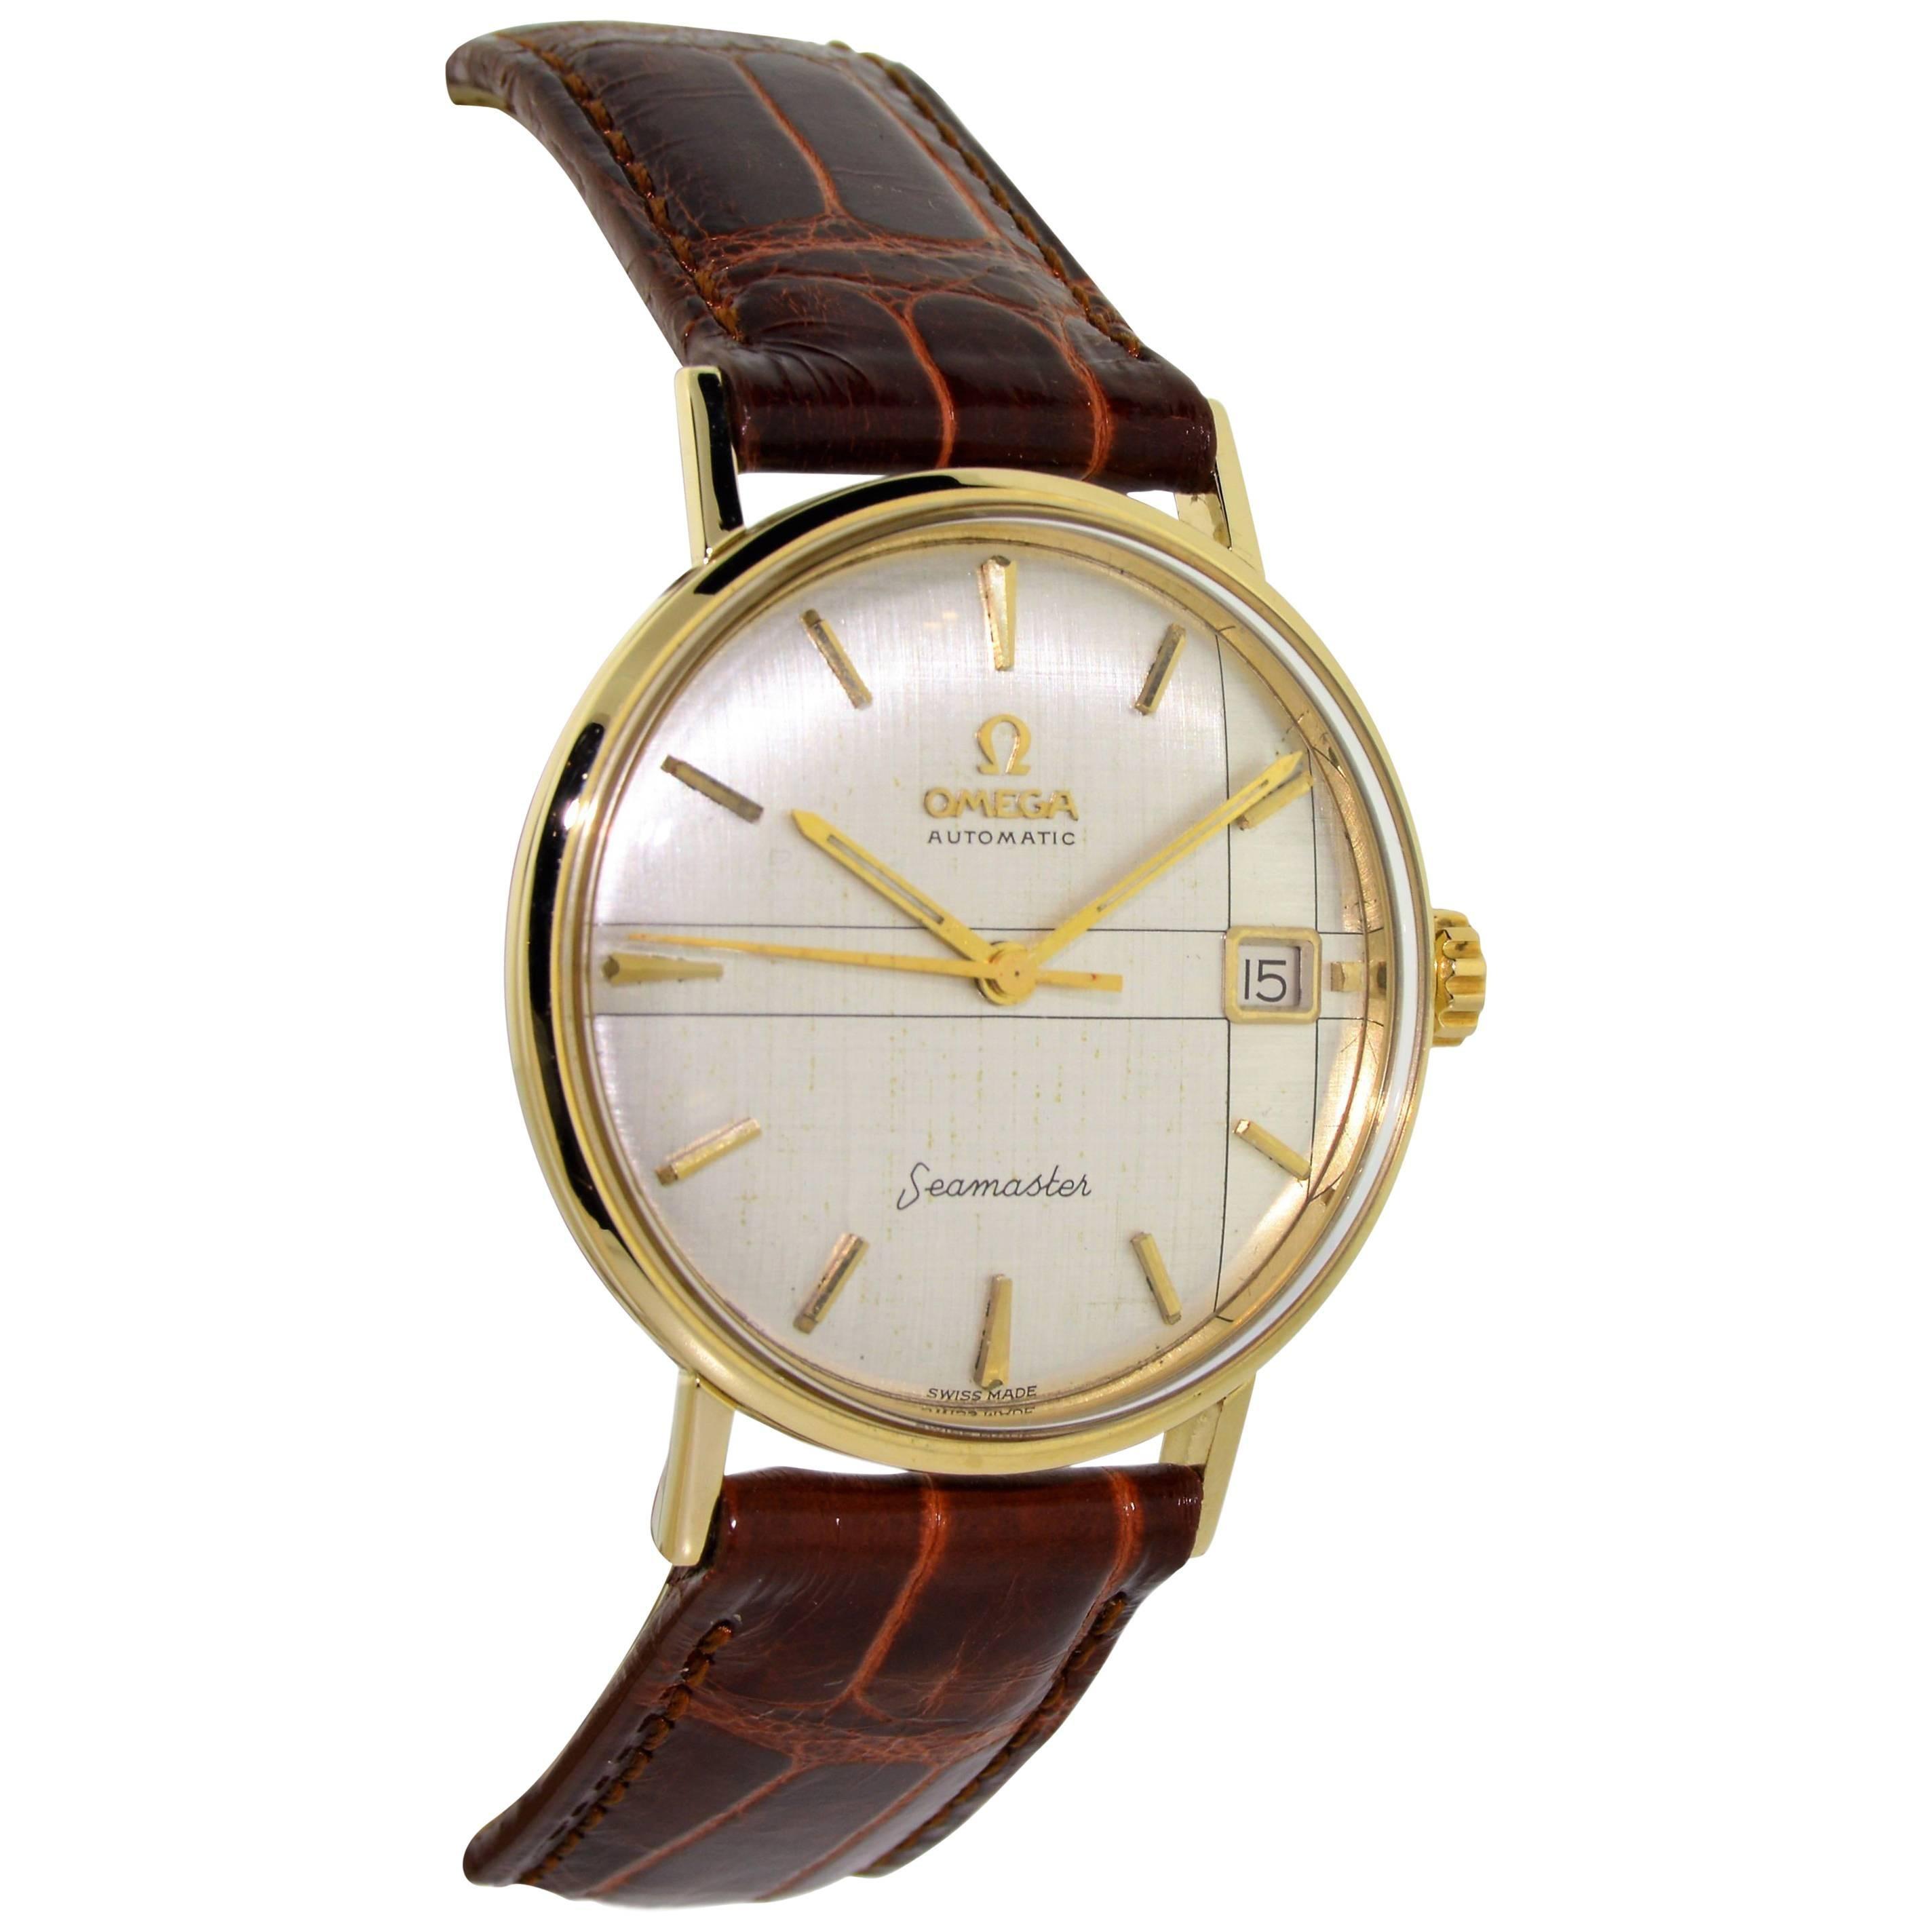 Omega 14 Karat Solid Yellow Gold with Unique Original Quadrant Dial Watch